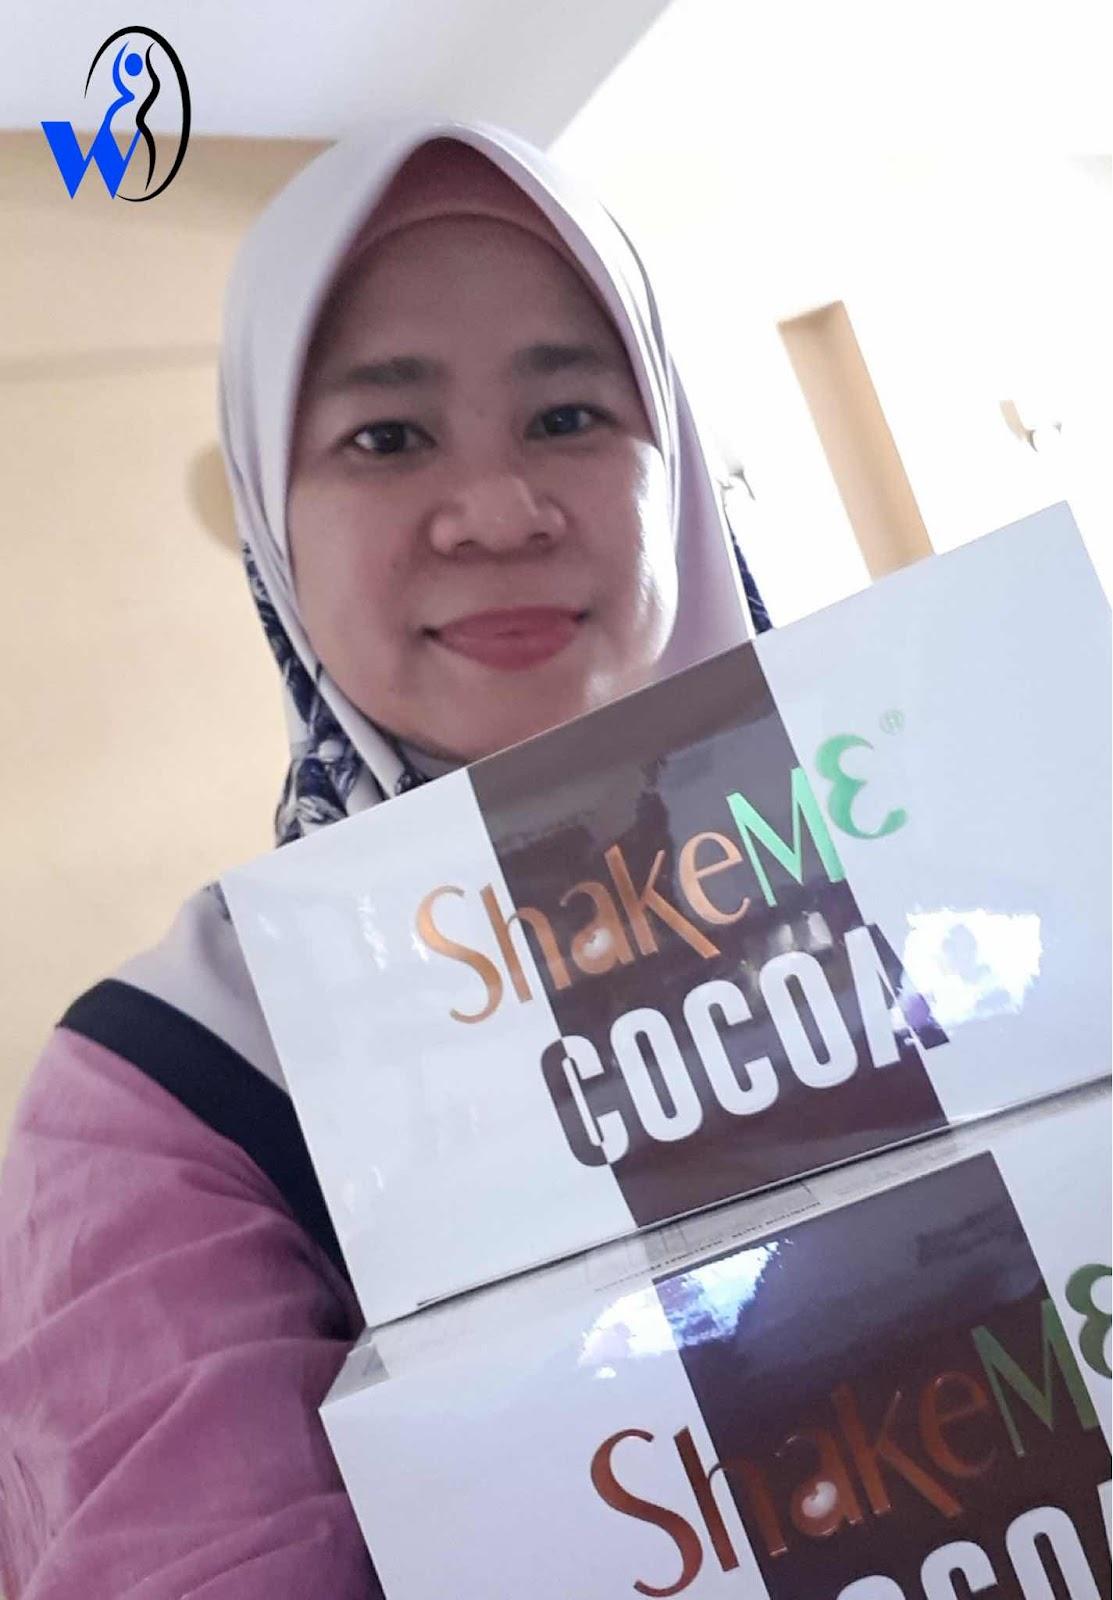 shake me cocoa-premium beautiful-min kaffe